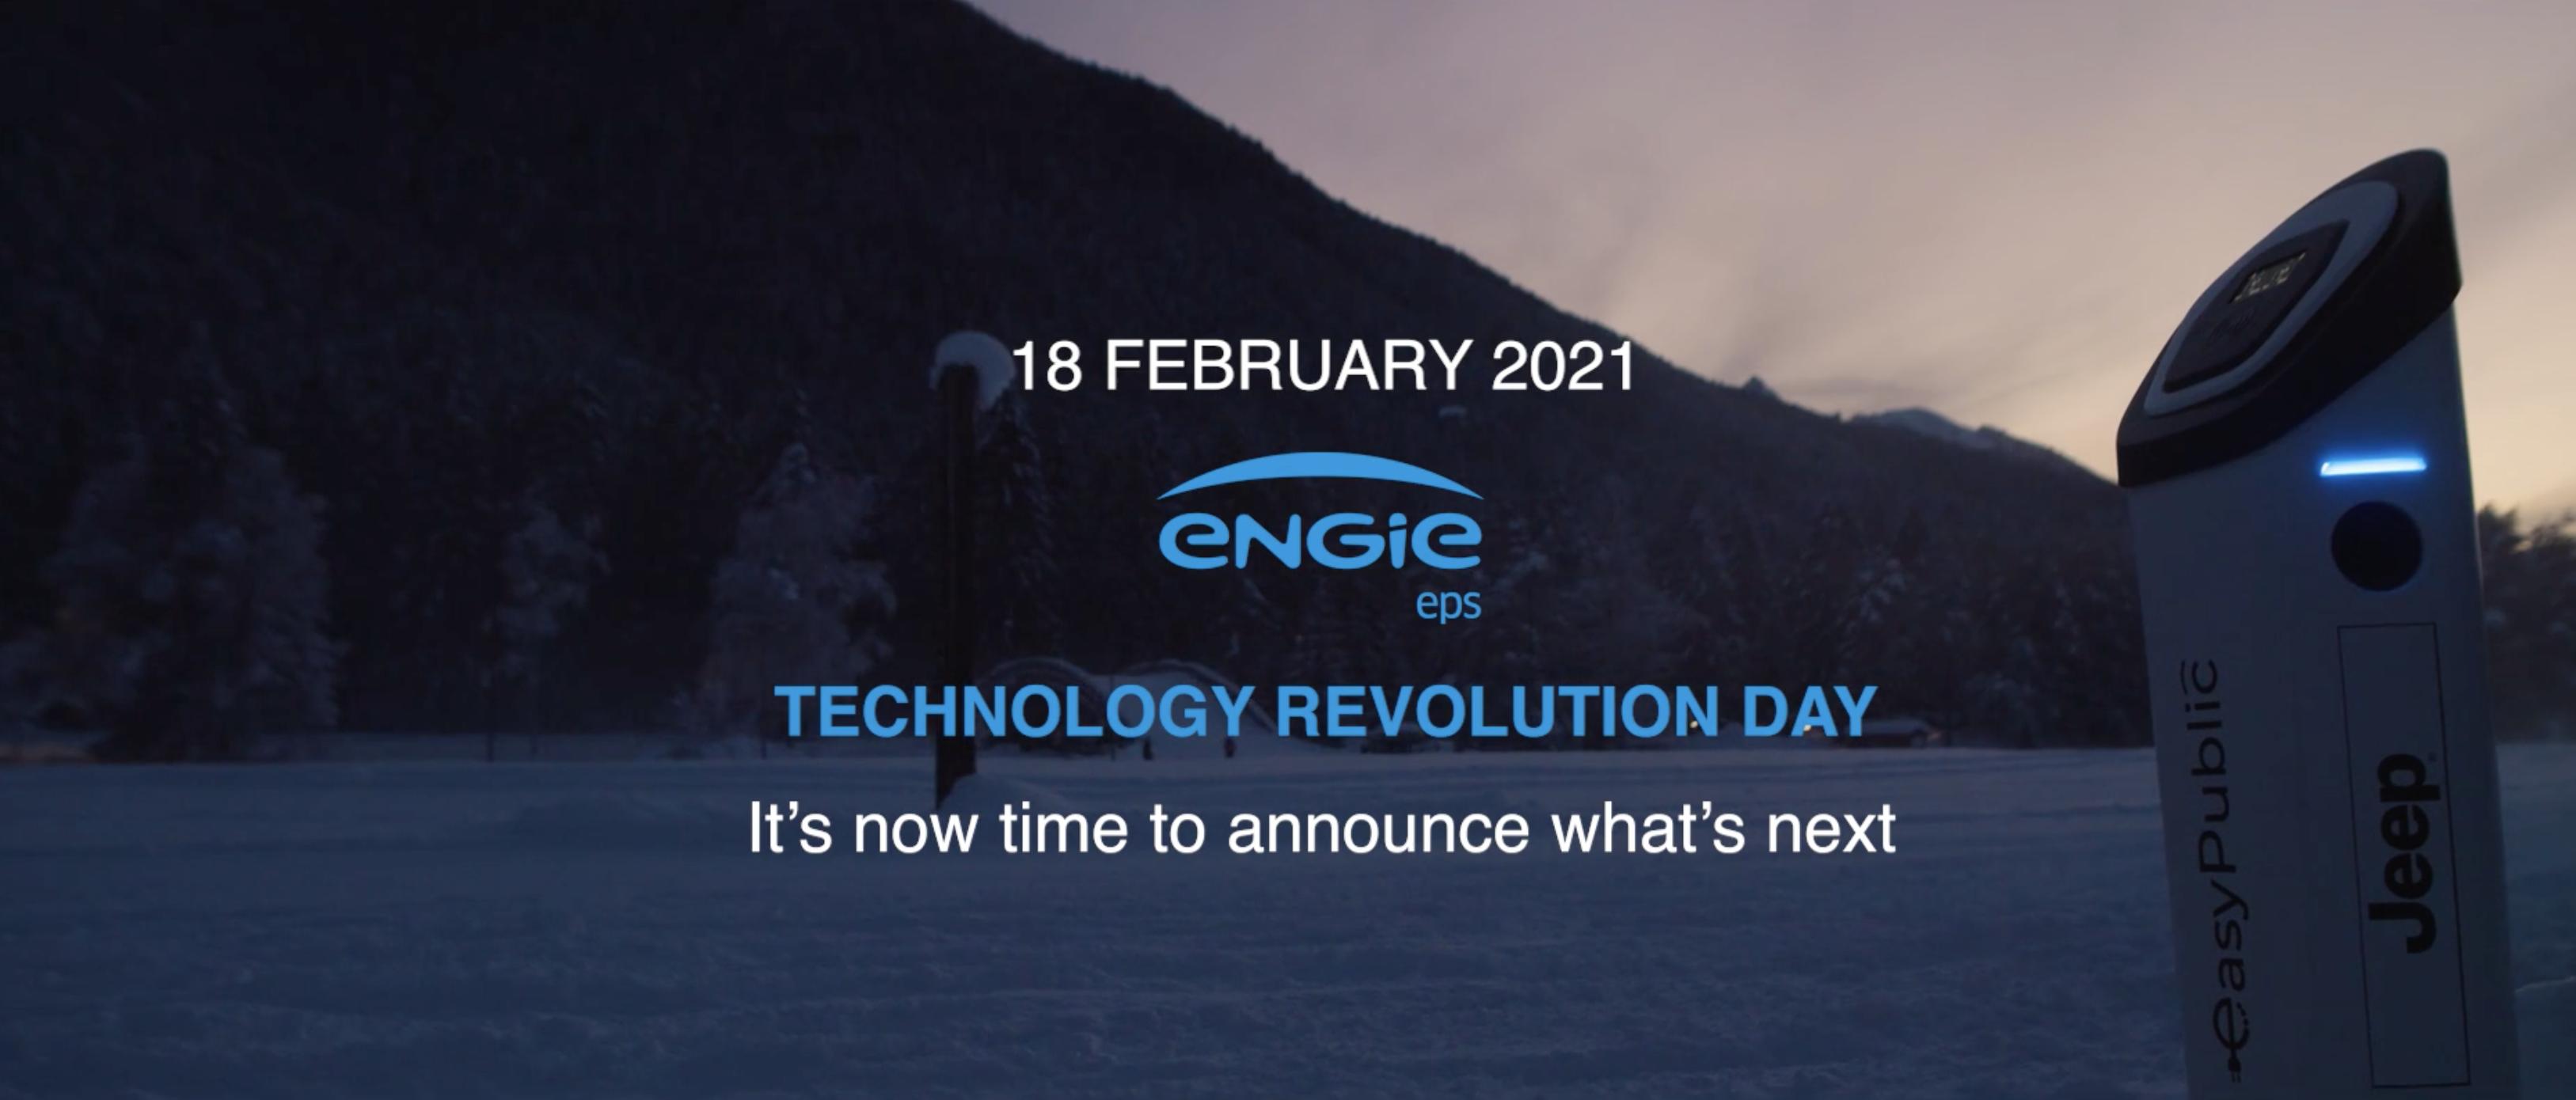 Engie_EPS_Technology_Revolution_Day_2021